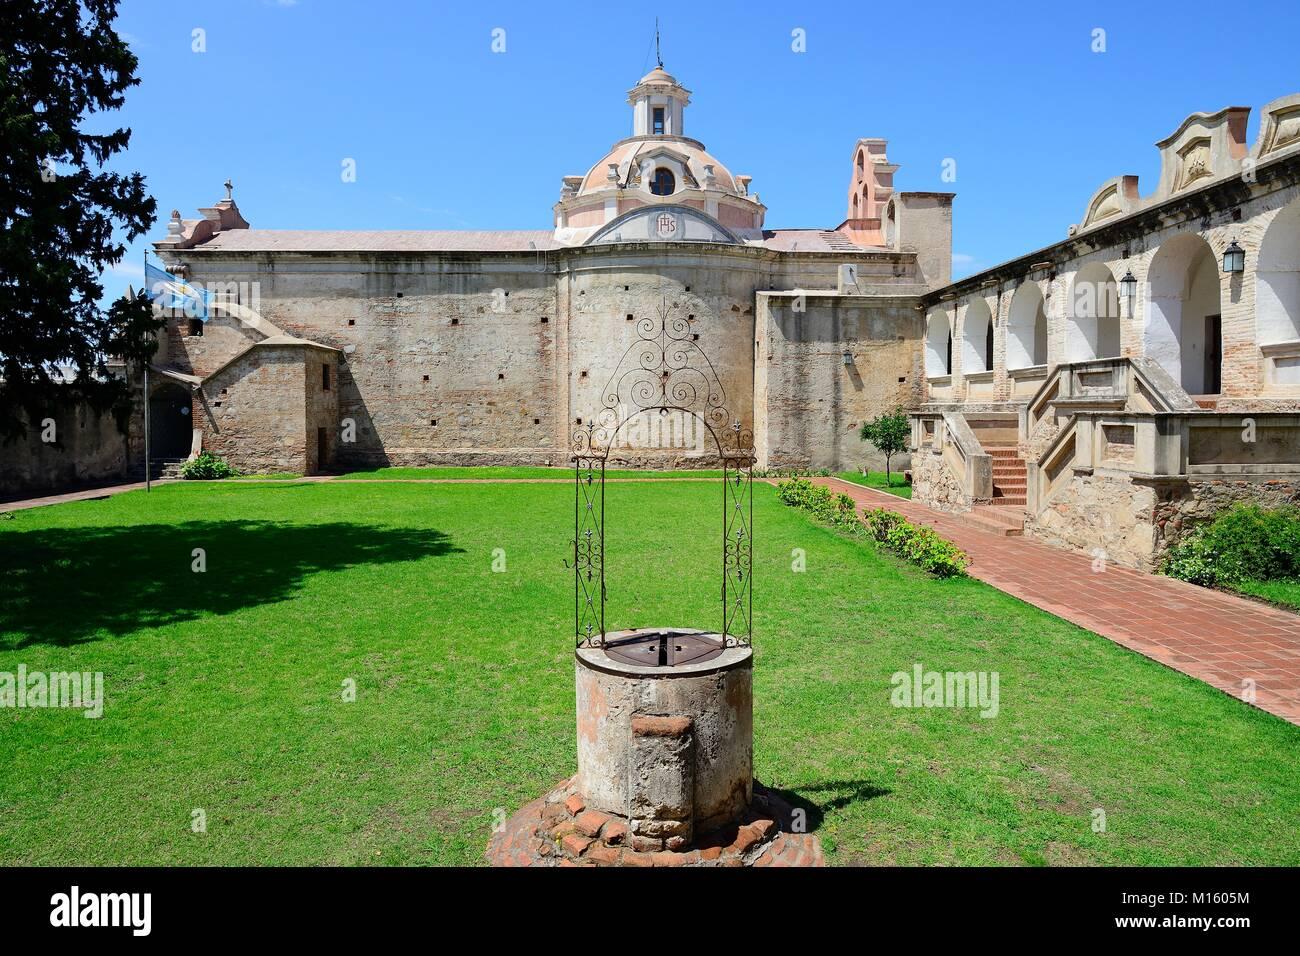 Draw well and Church of the Jesuit Mission,Museo Estancia Jesuitica,Alta Gracia,Province of Córdoba,Argentina - Stock Image